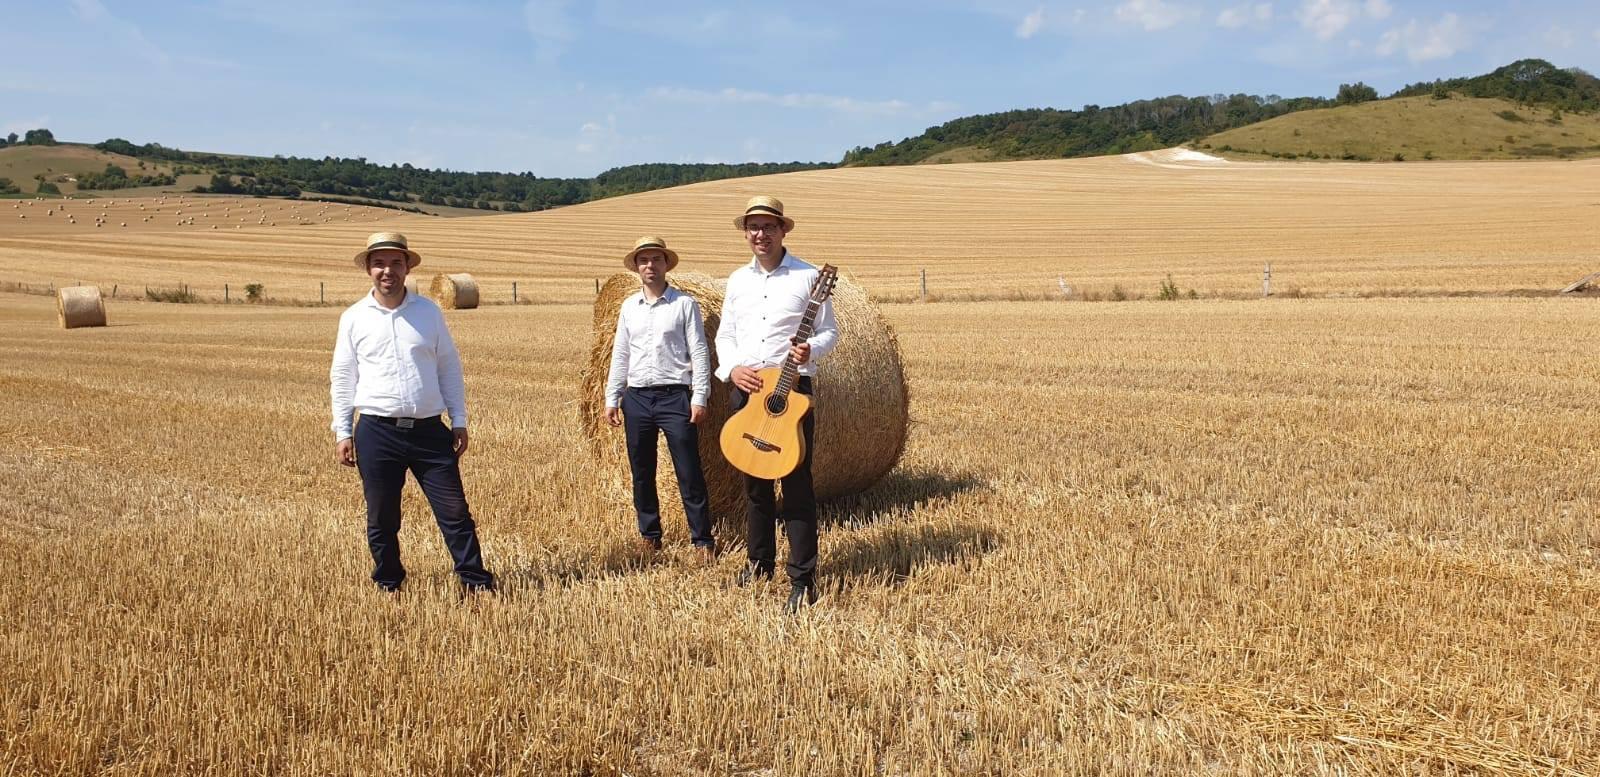 En campagne Normande -Juin 2020